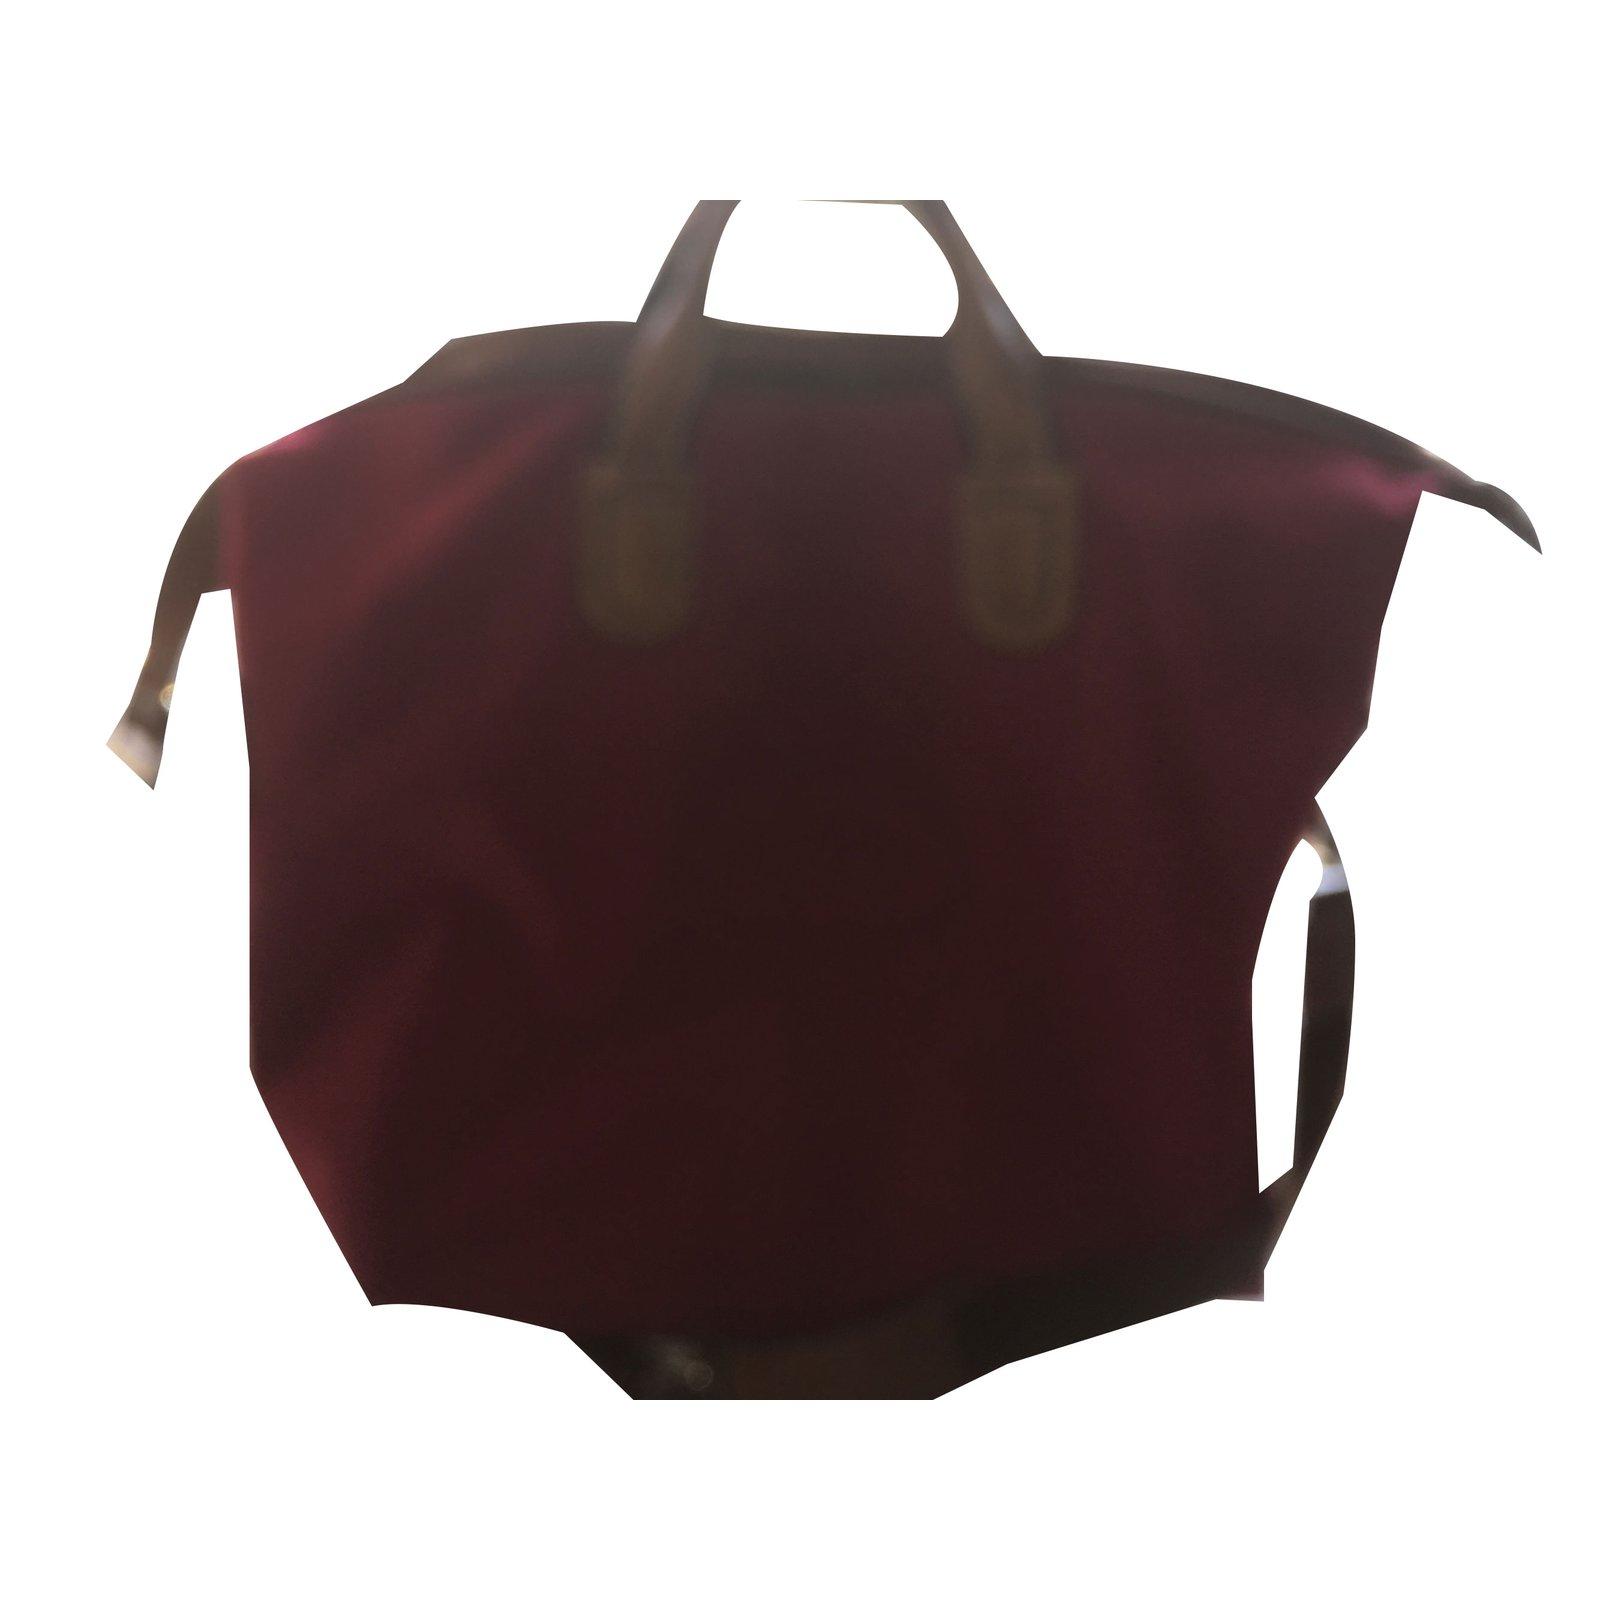 sacs de voyage lancel sac week end toile bordeaux joli closet. Black Bedroom Furniture Sets. Home Design Ideas